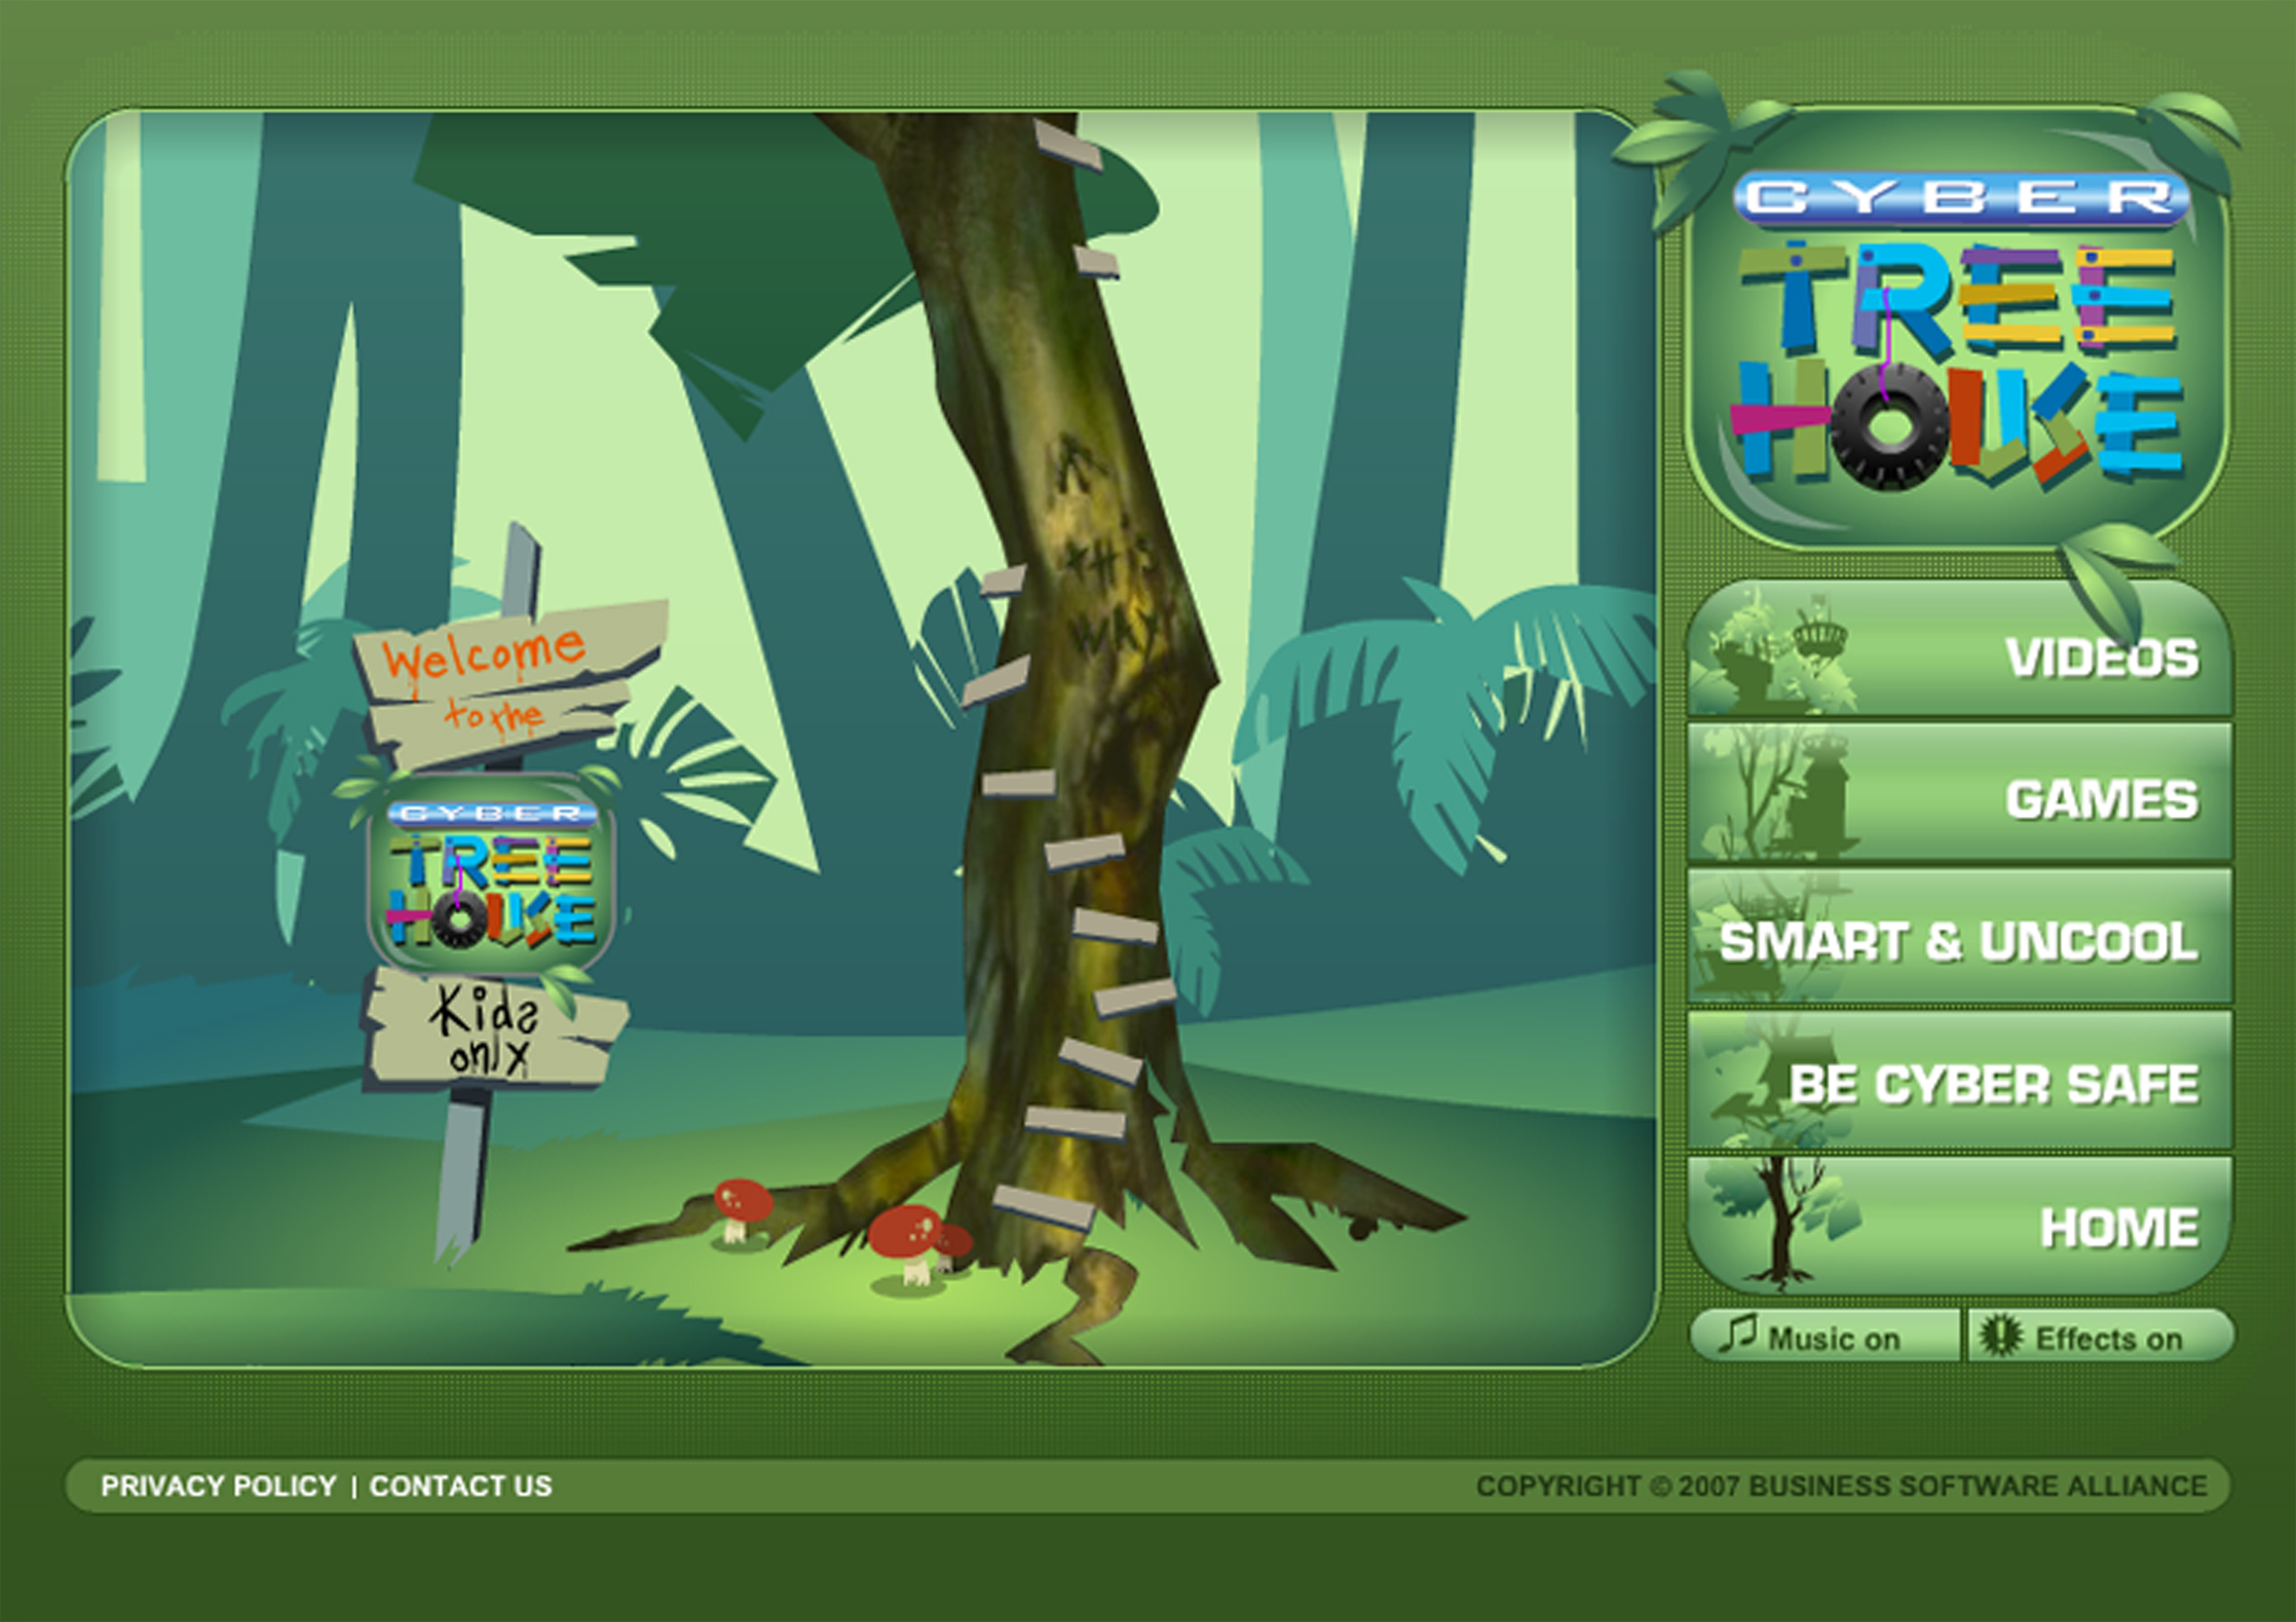 BSA Cyber Tree House image